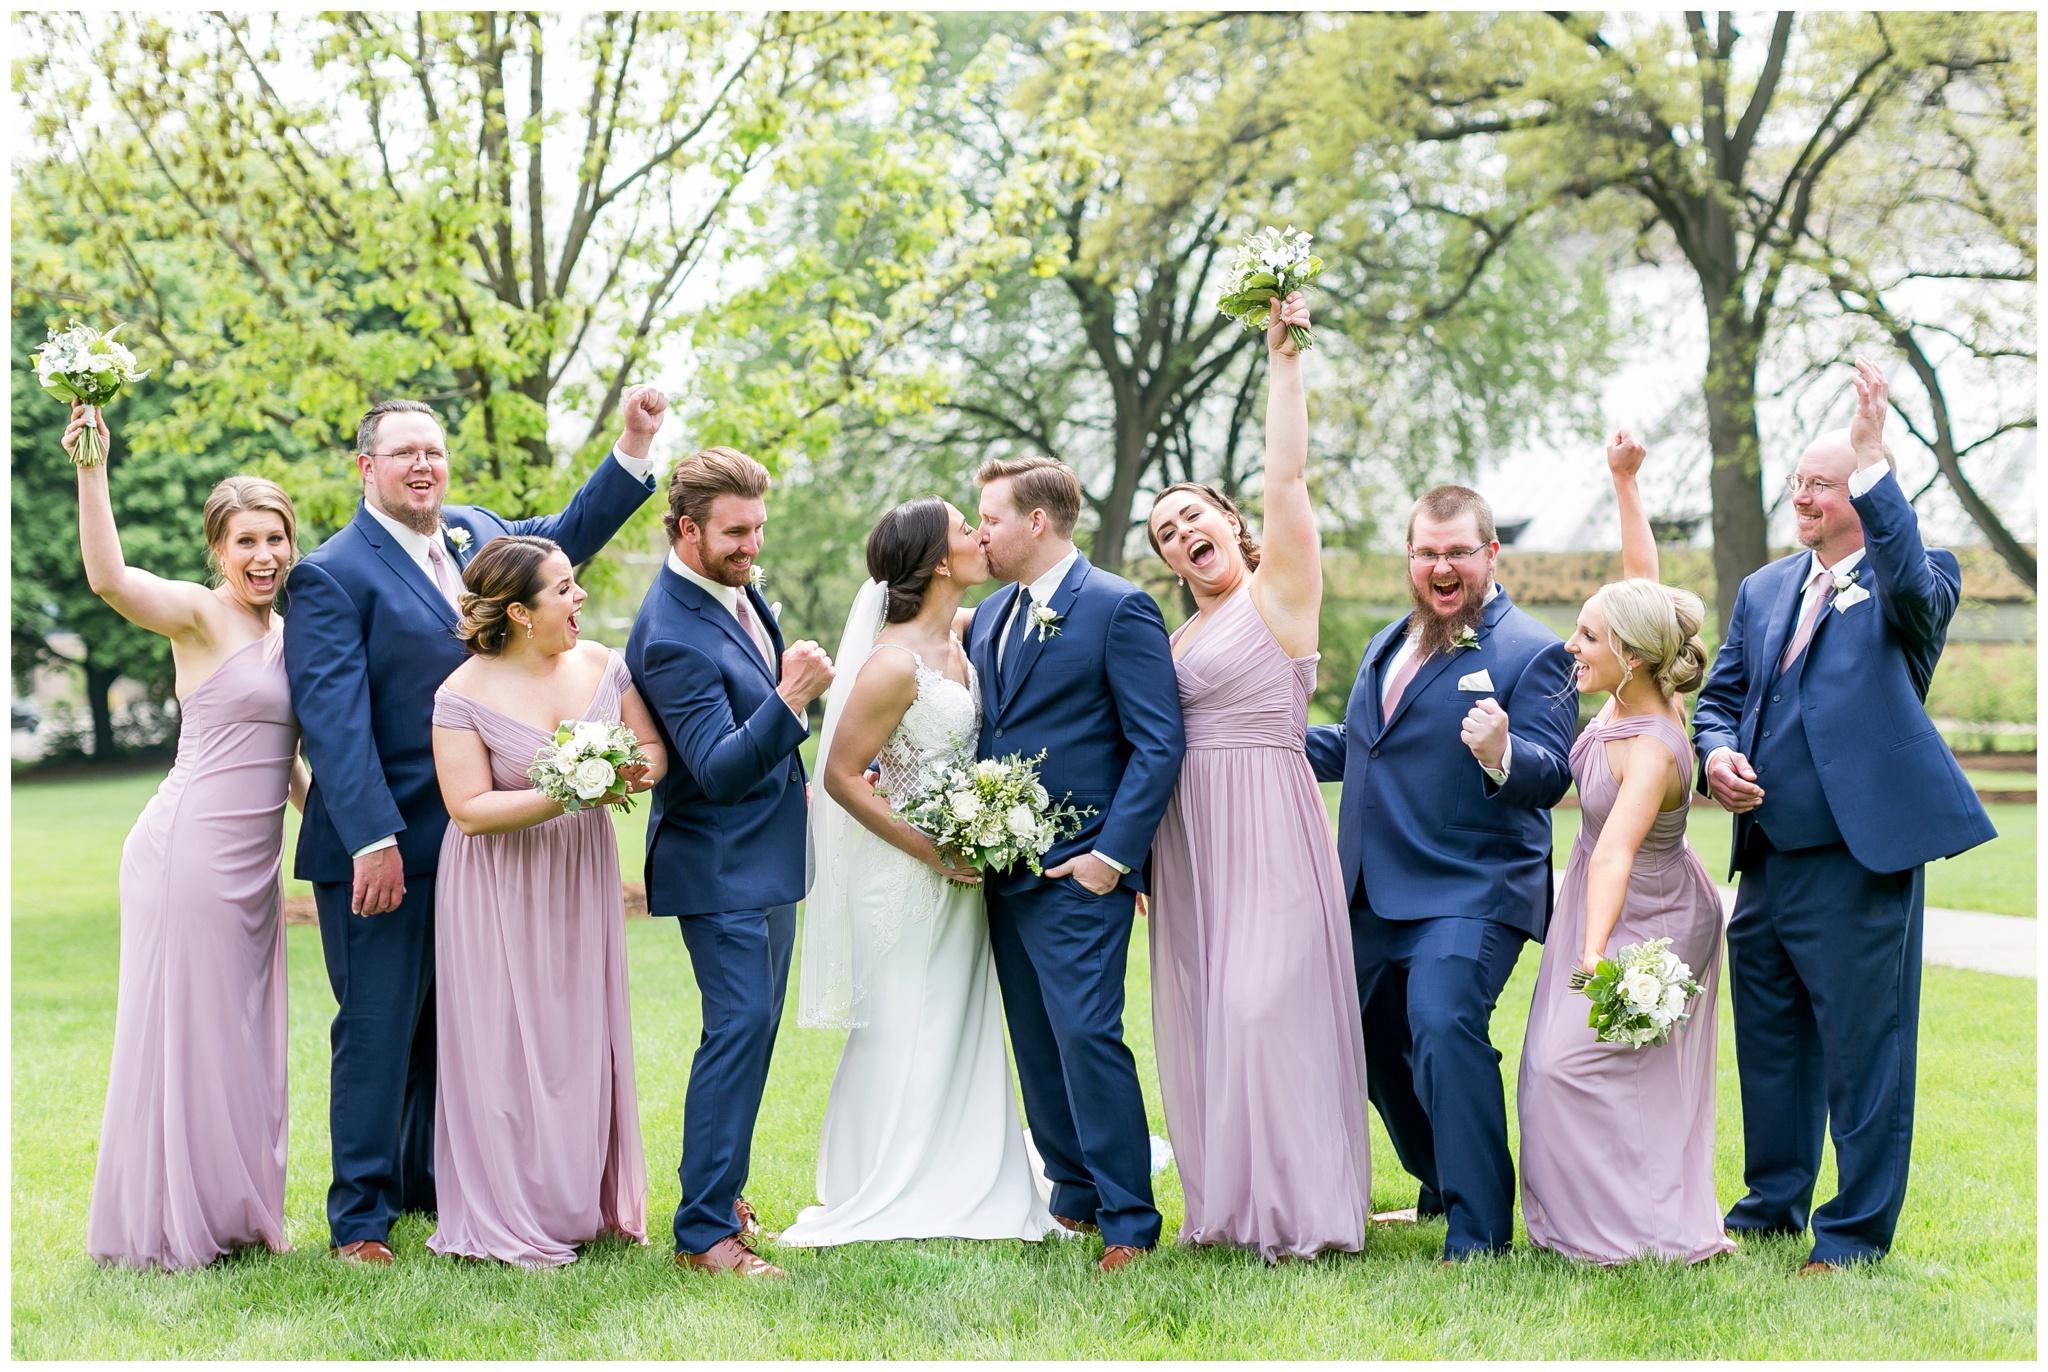 Union_south_Wedding_Madison_Wisconsin_Caynay_Photo_3662.jpg